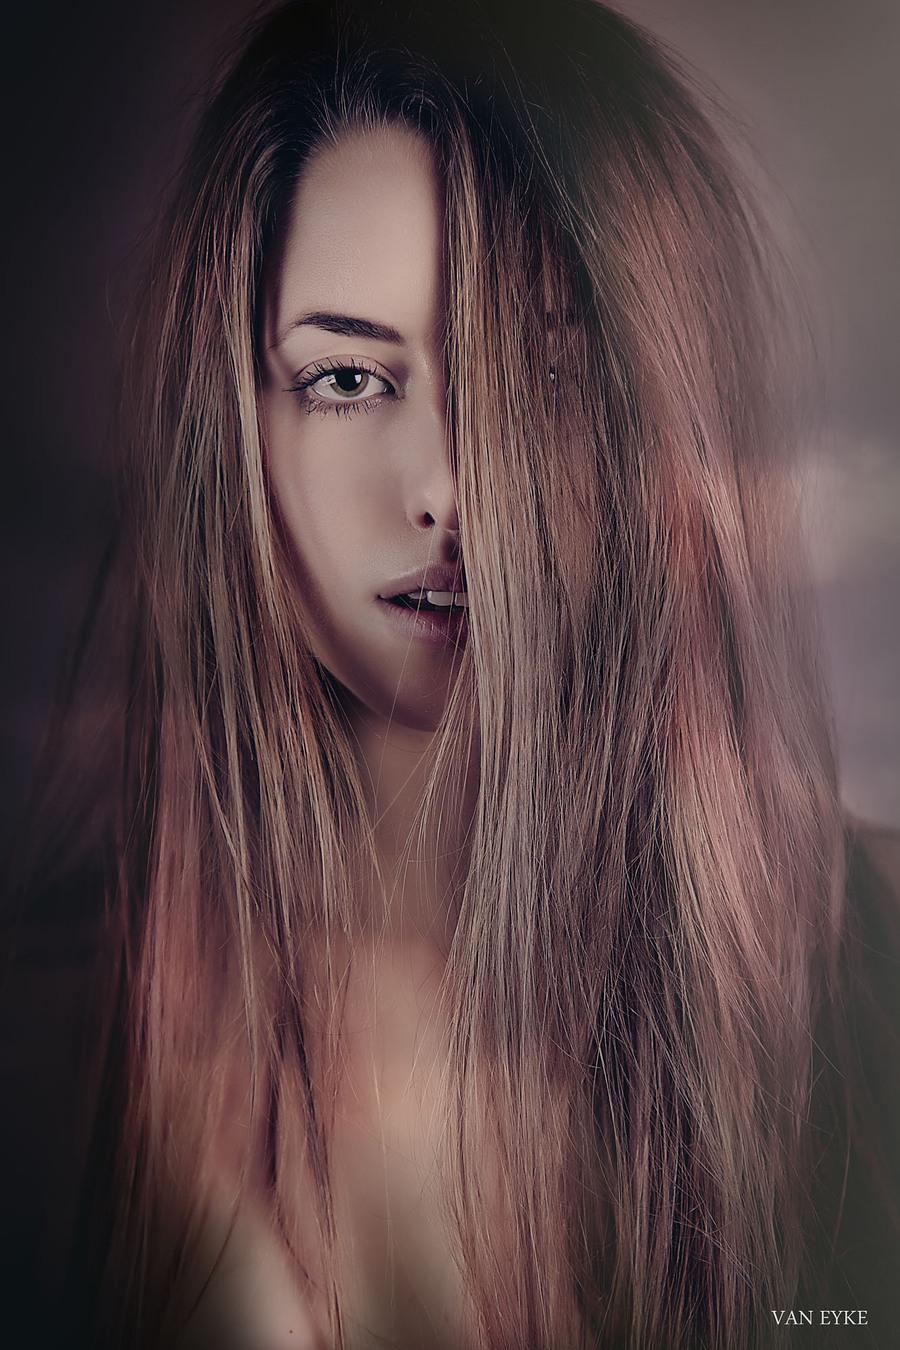 Photography by VanEyke, Model Josie Lauren / Uploaded 8th November 2015 @ 06:39 PM